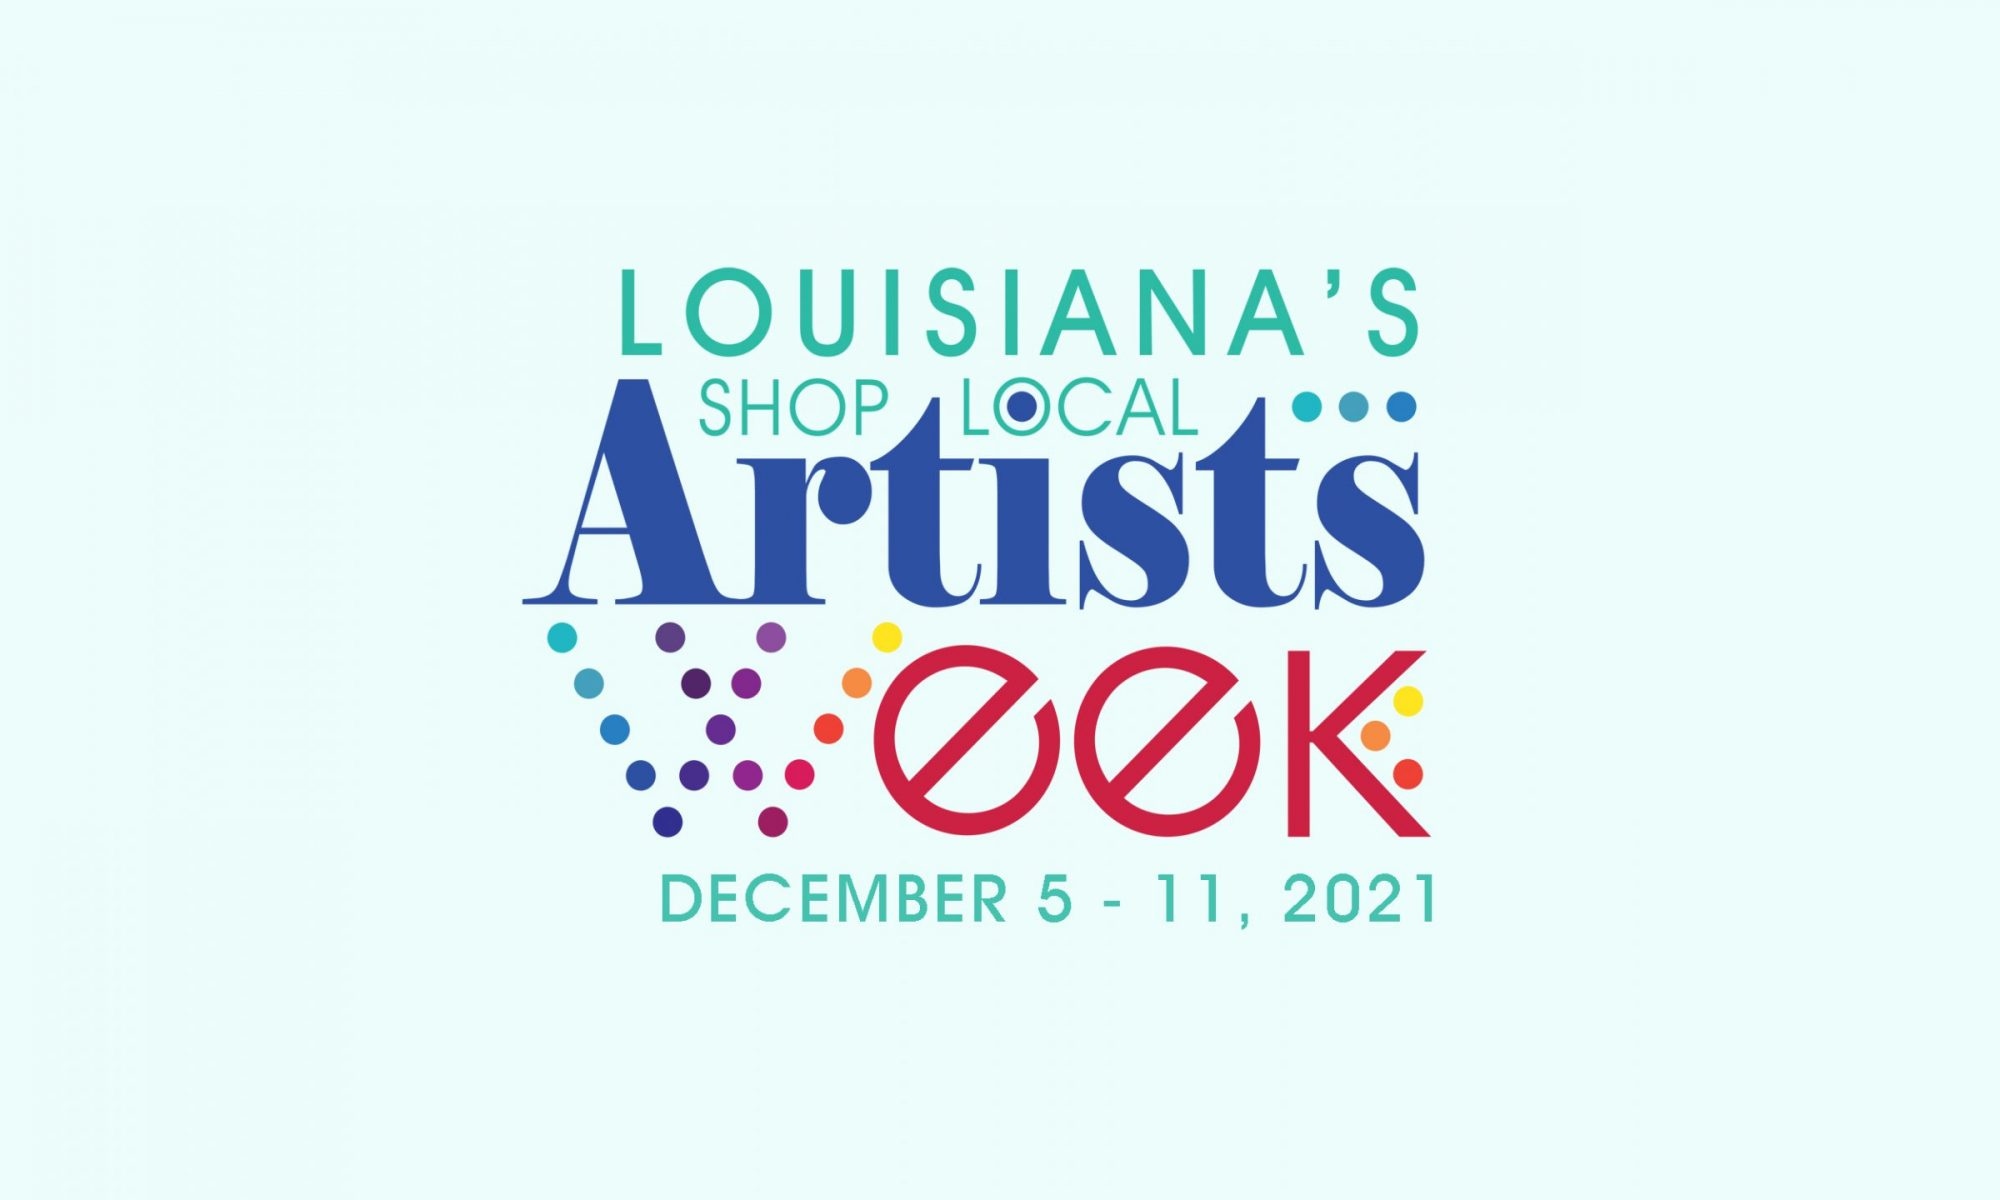 Shop Local Artists Week